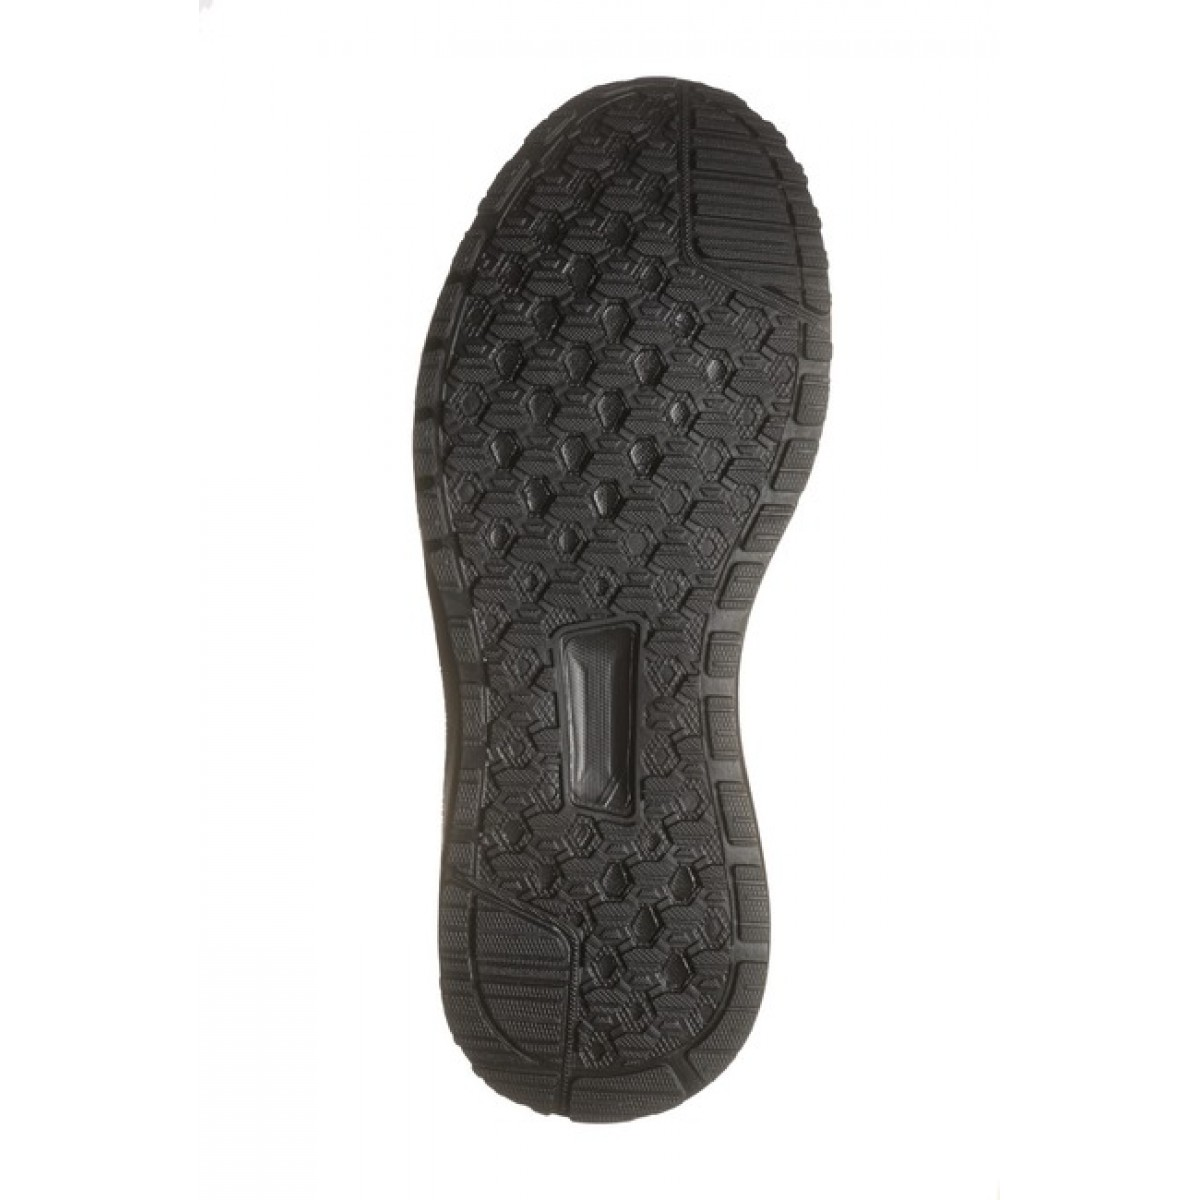 Adidas Energy Cloud 2 (Black)